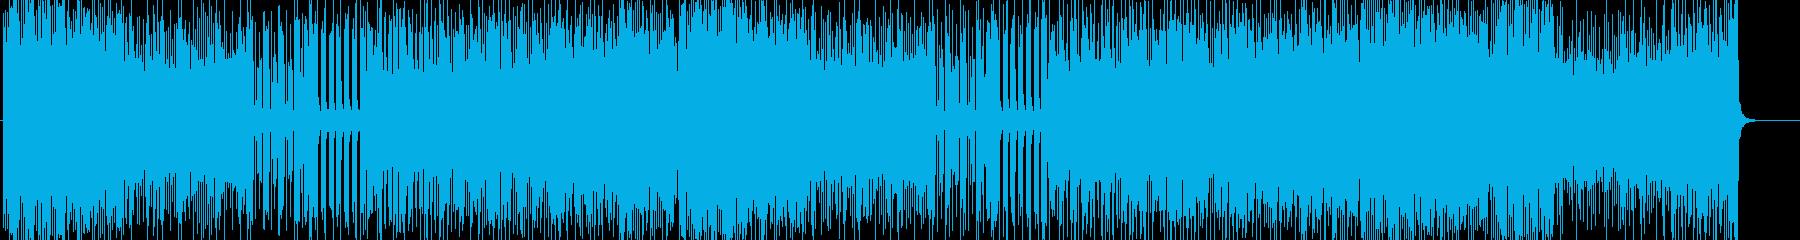 「HR/HM」「ROCK」BGM213の再生済みの波形